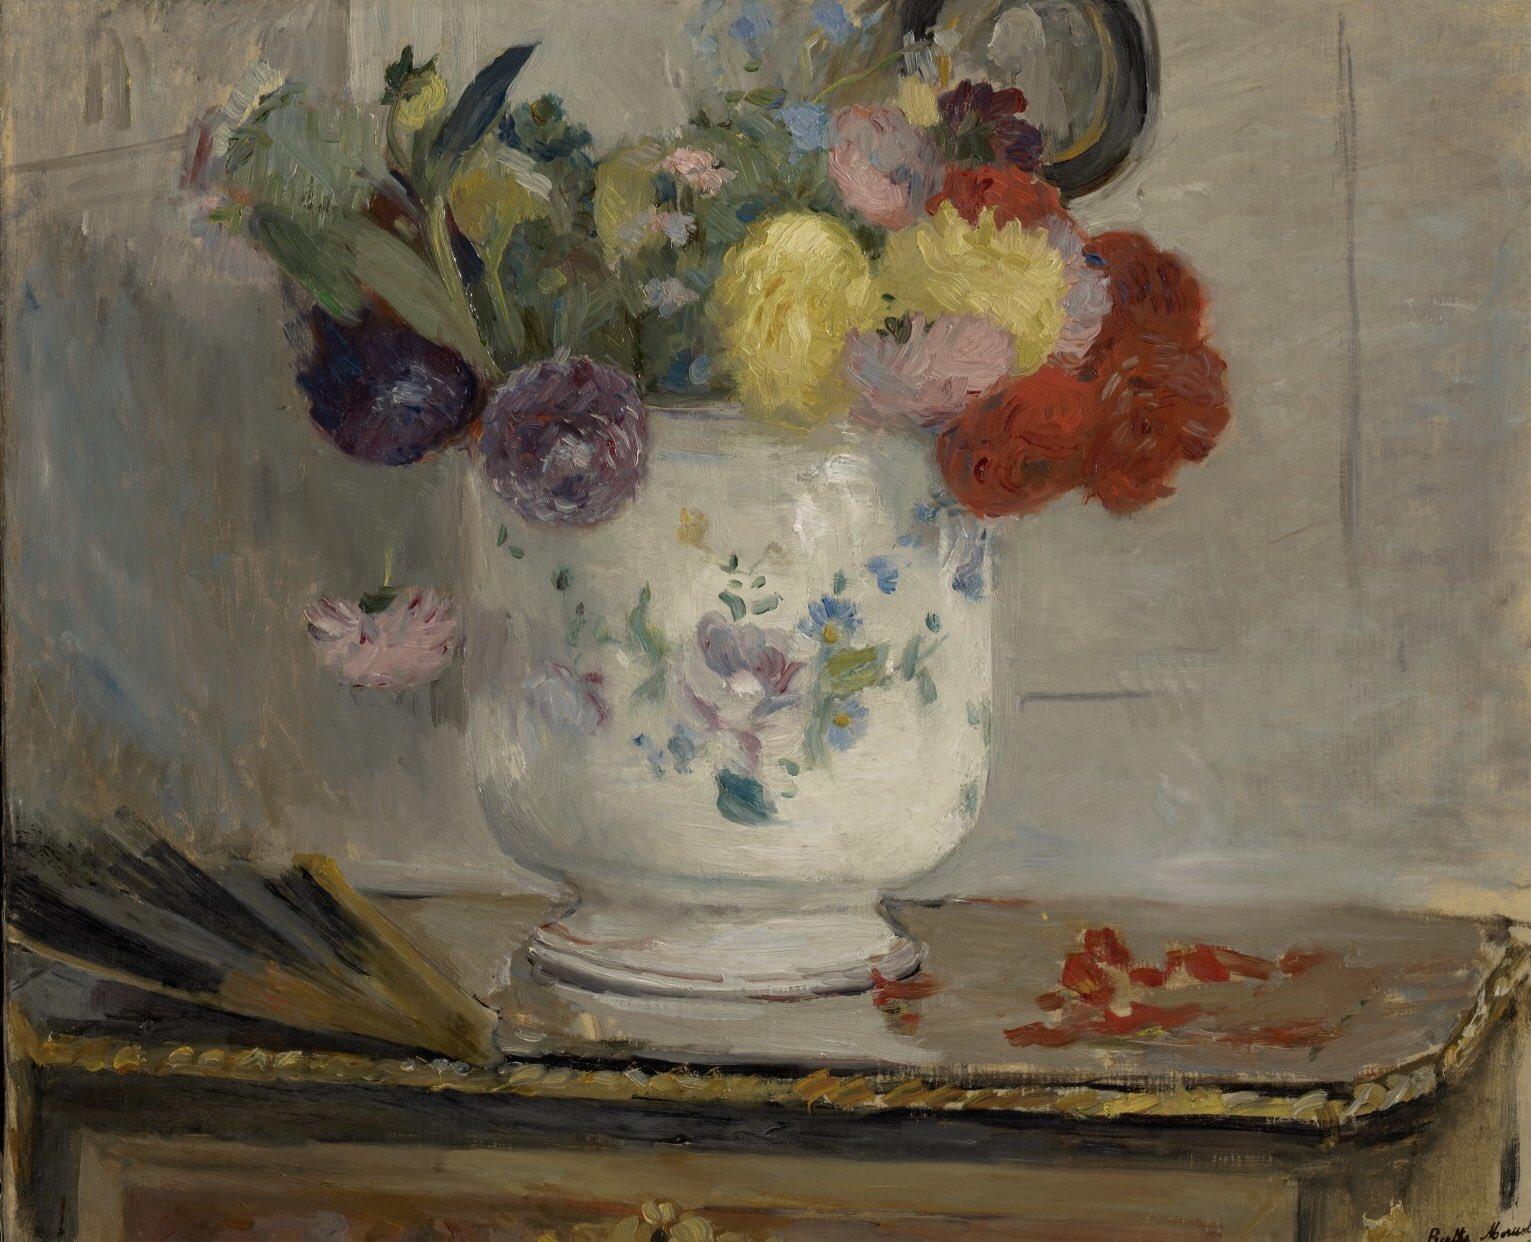 "Clark Art Institute on Twitter: ""Ohhhhh...the simple, wonderful glory of a Berthe  Morisot floral. No better way to celebrate her birthday. @artistmorisot  #bornonthisday #BertheMorisot #impressionistwomen Berthe Morisot, Dahlias,  1876, oil on canvas."